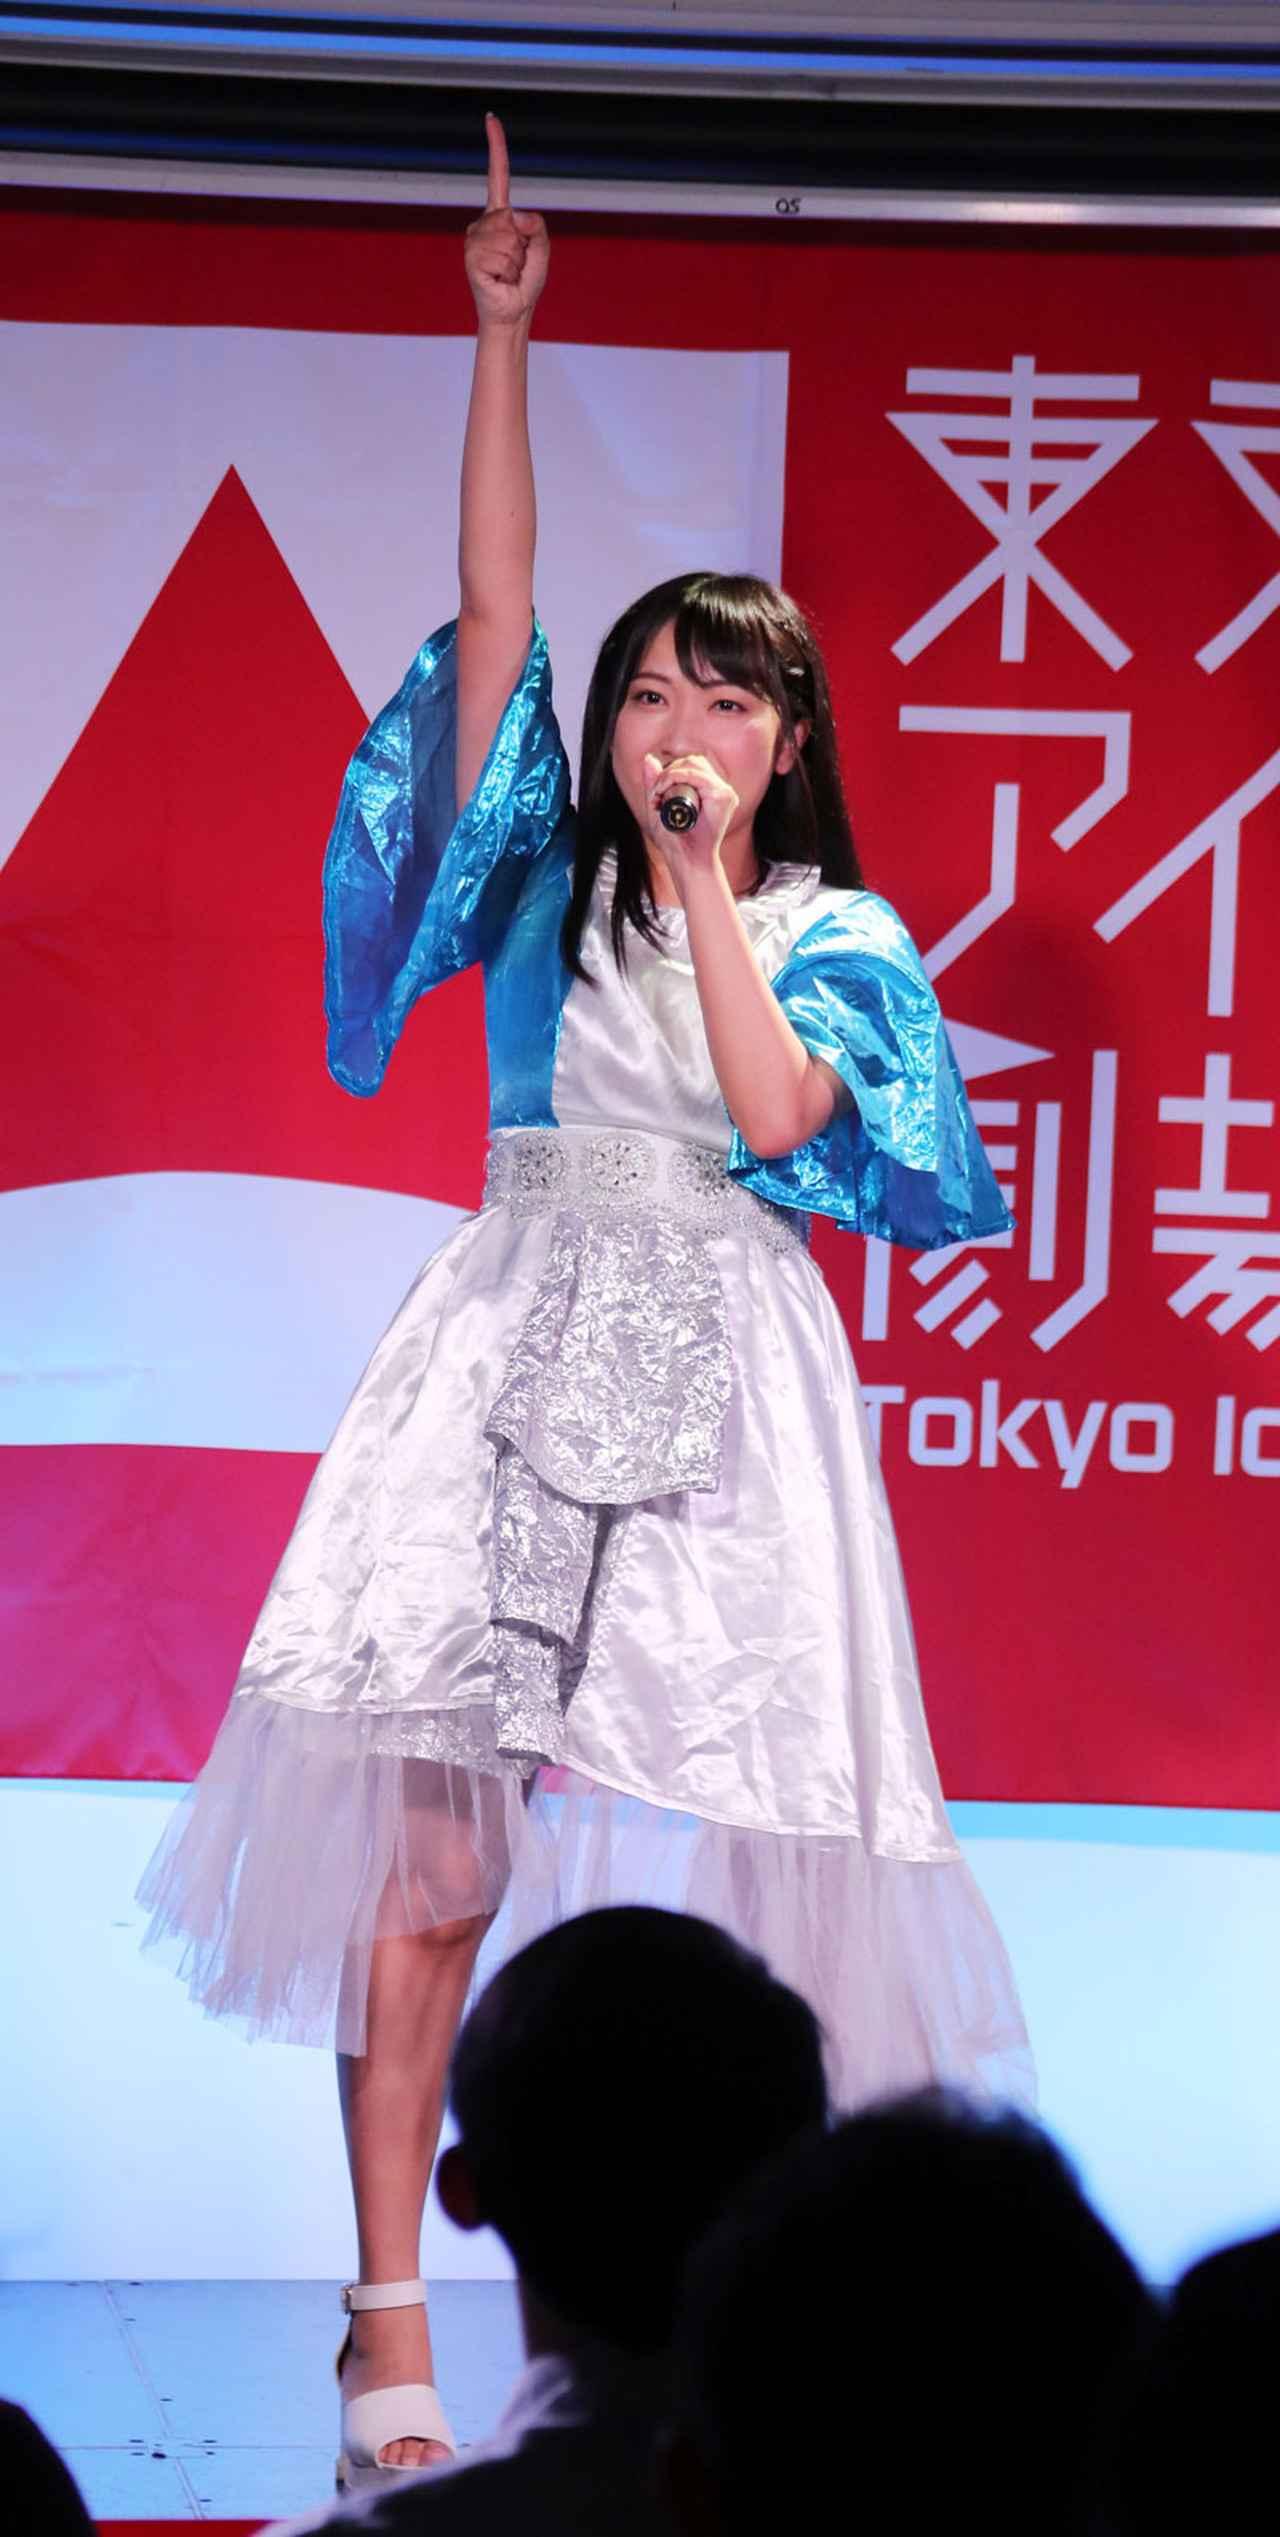 Images : 15番目の画像 - 「ミライスカート/関東ファン喝采の定期公演無事開催! さらに美しくなった歌声と切れ味のあるダンスで来場者を魅了した」のアルバム - Stereo Sound ONLINE